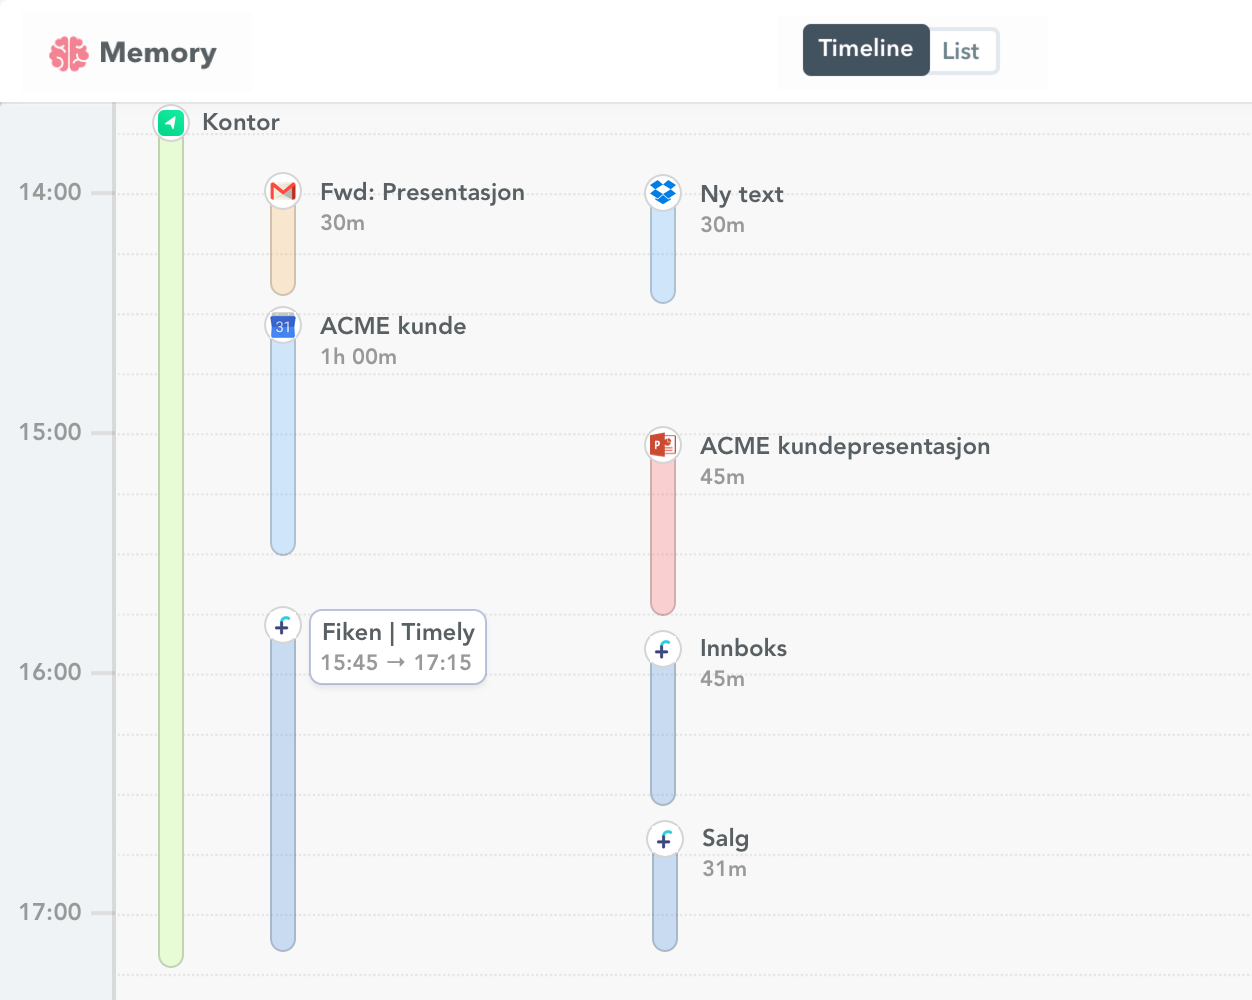 Fiken time tracking